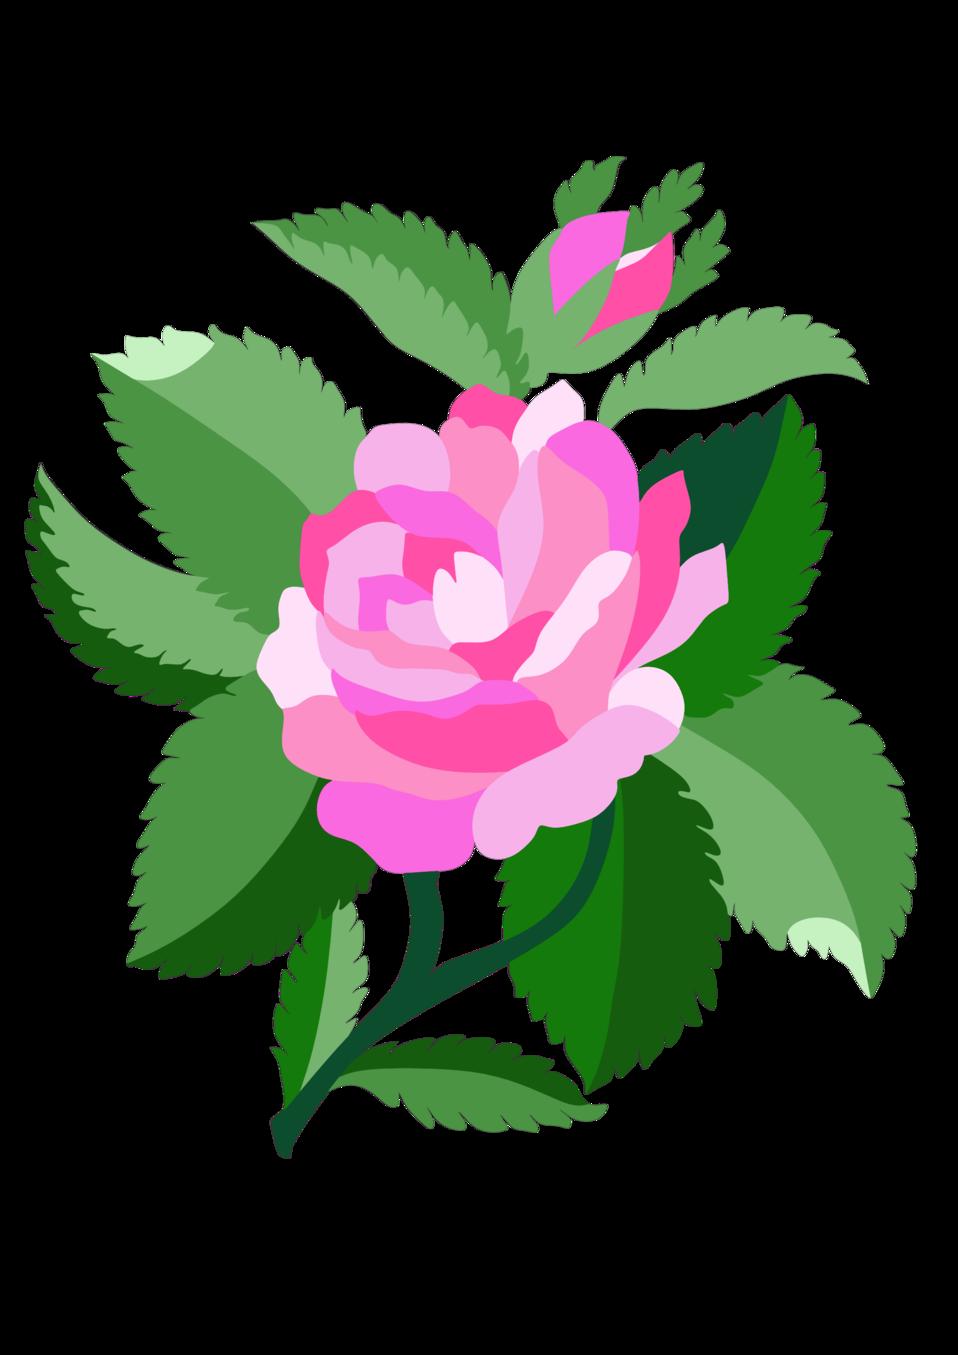 958x1355 Public Domain Clip Art Image Design For Damask Rose Id